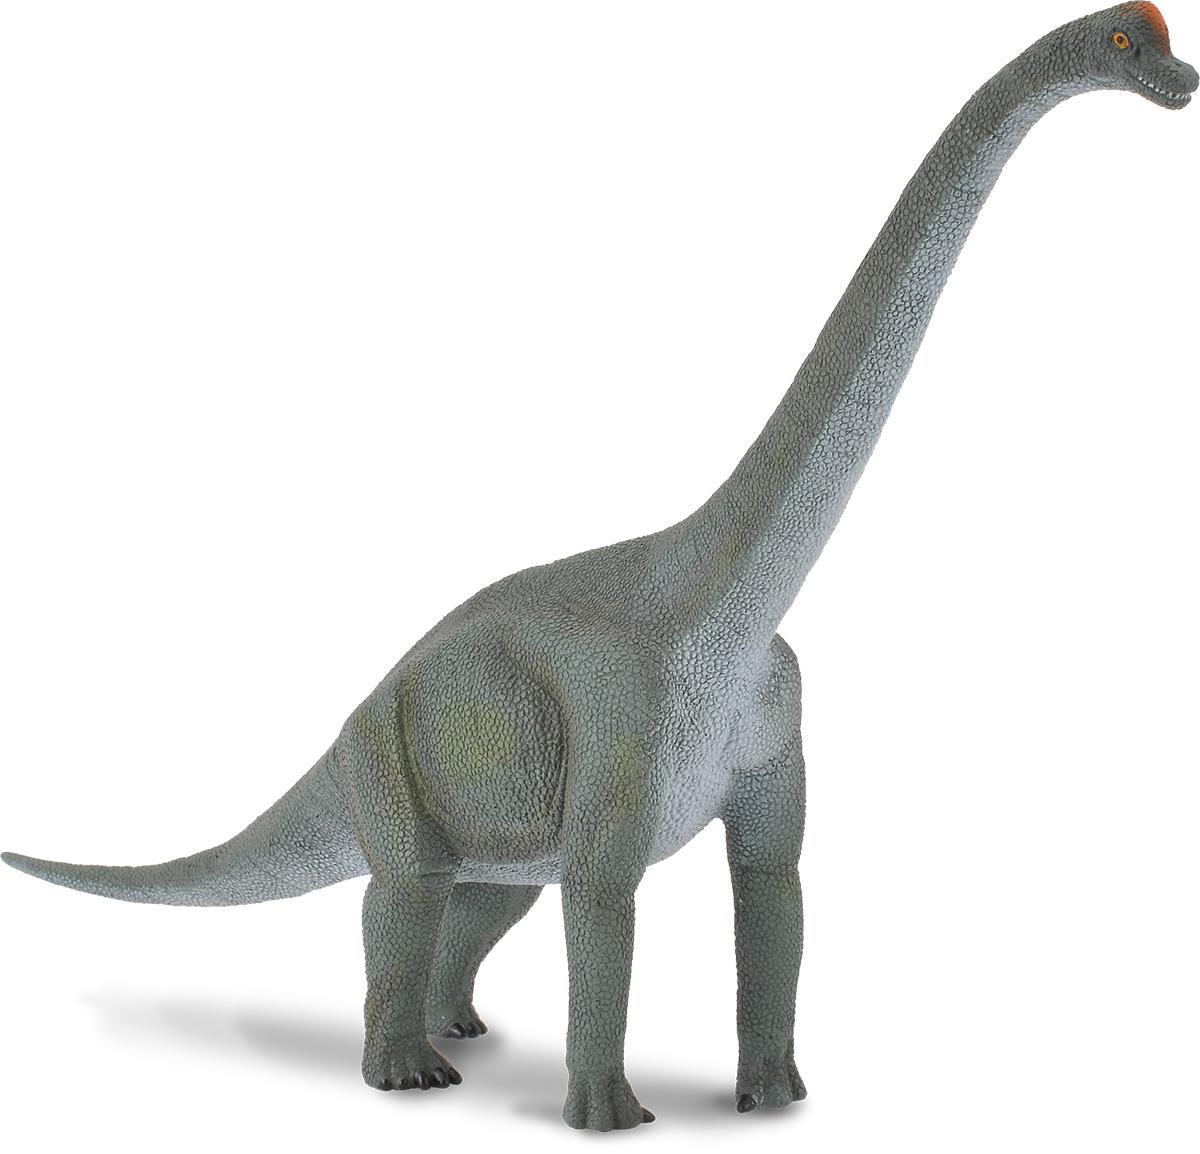 Collecta Фигурка Брахиозавр collecta дилофозавр синий l 12 9 см